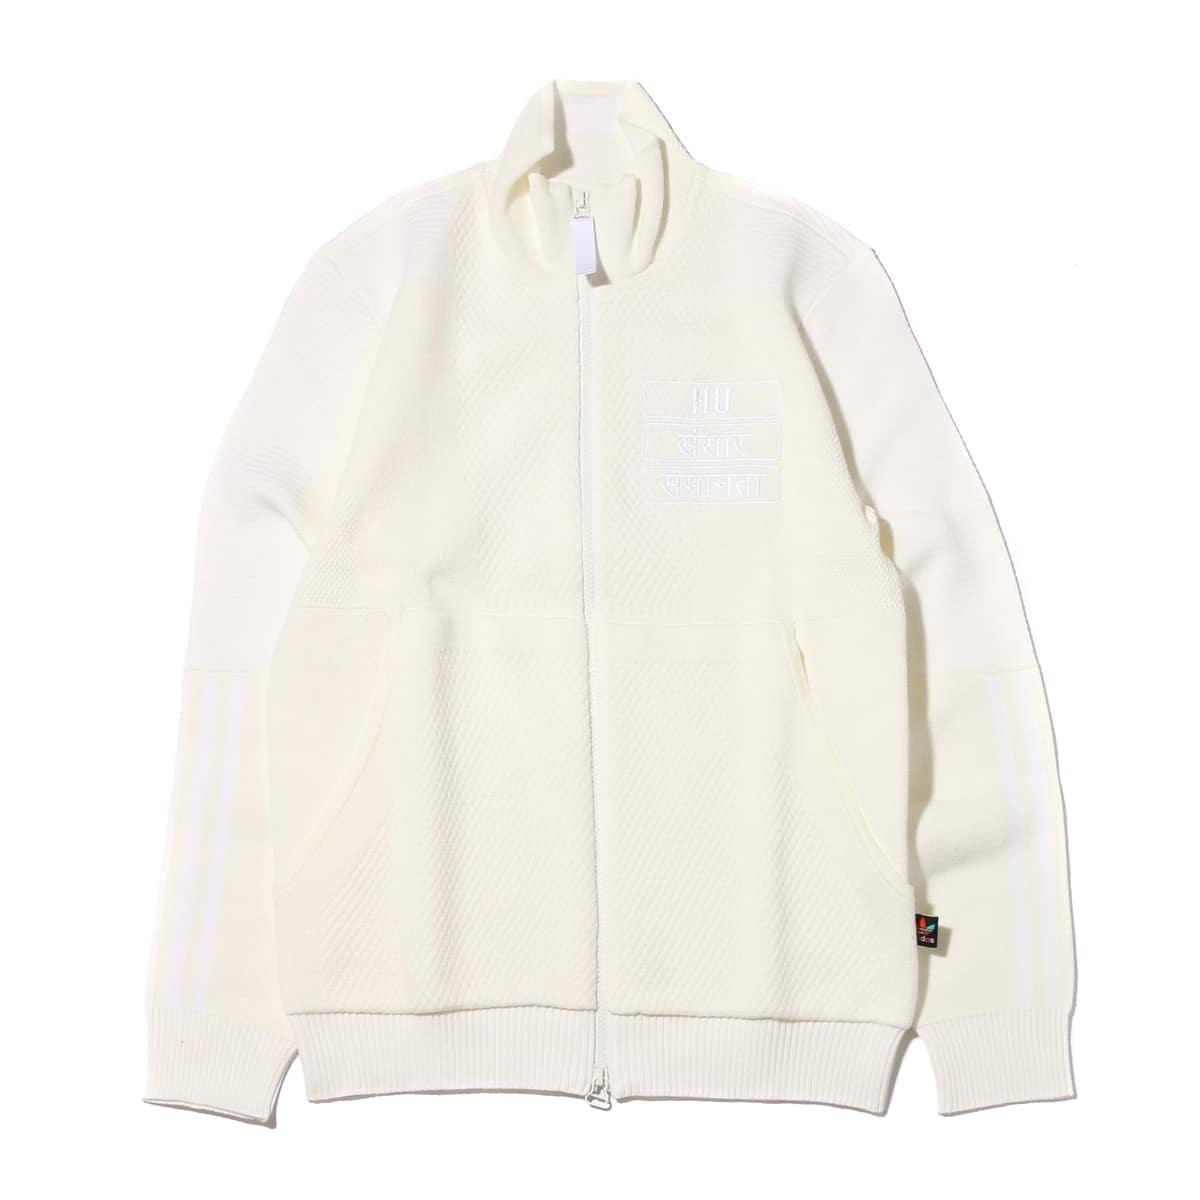 adidas Originals HU HOLI KNIT TRACK TOP  Off White/White_photo_large